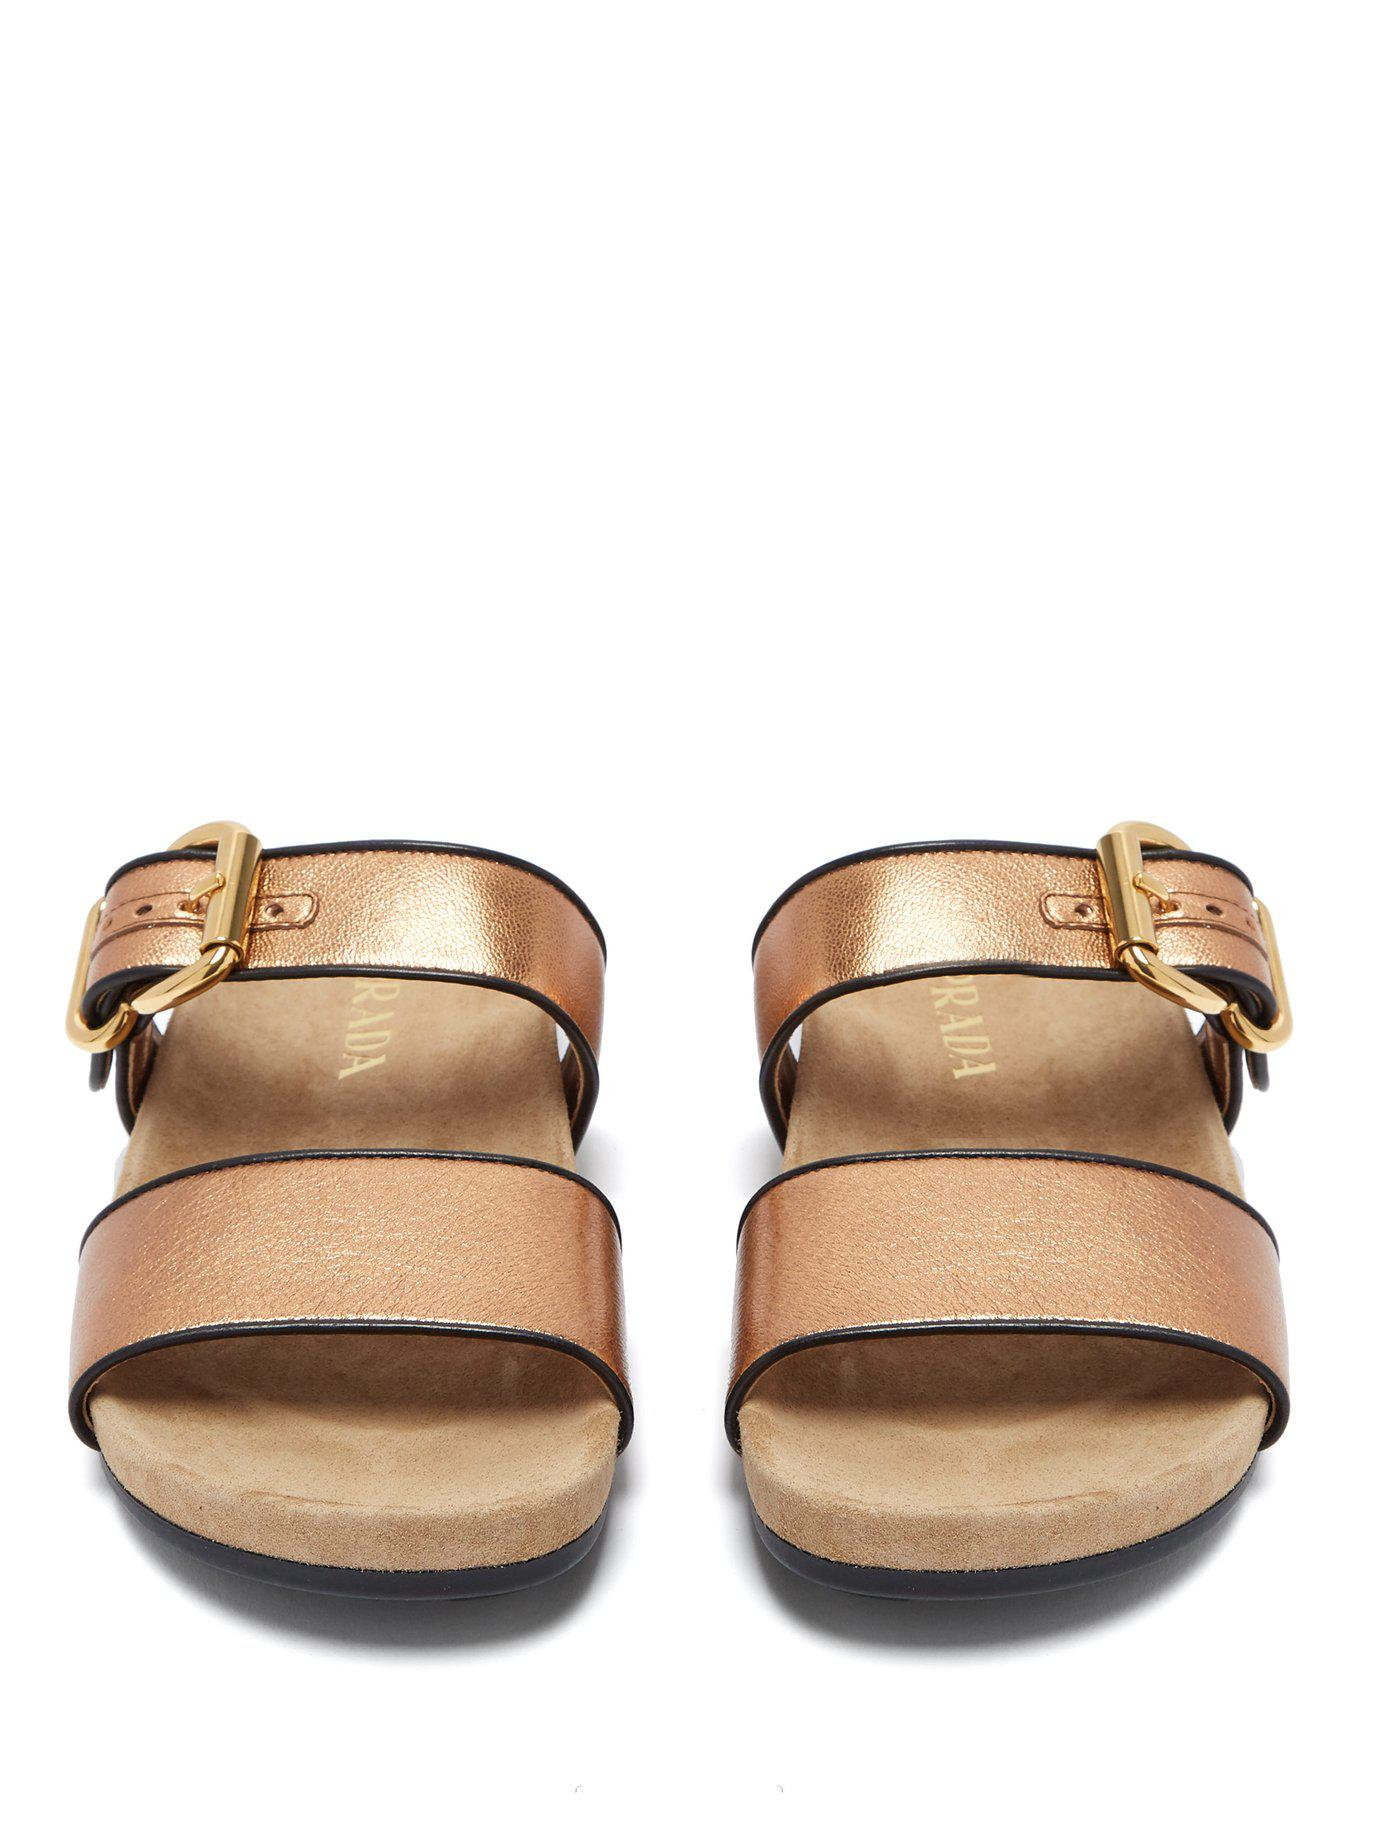 1e9800431a3 Prada - Multicolor Double Strap Metallic Leather Slides - Lyst. View  fullscreen